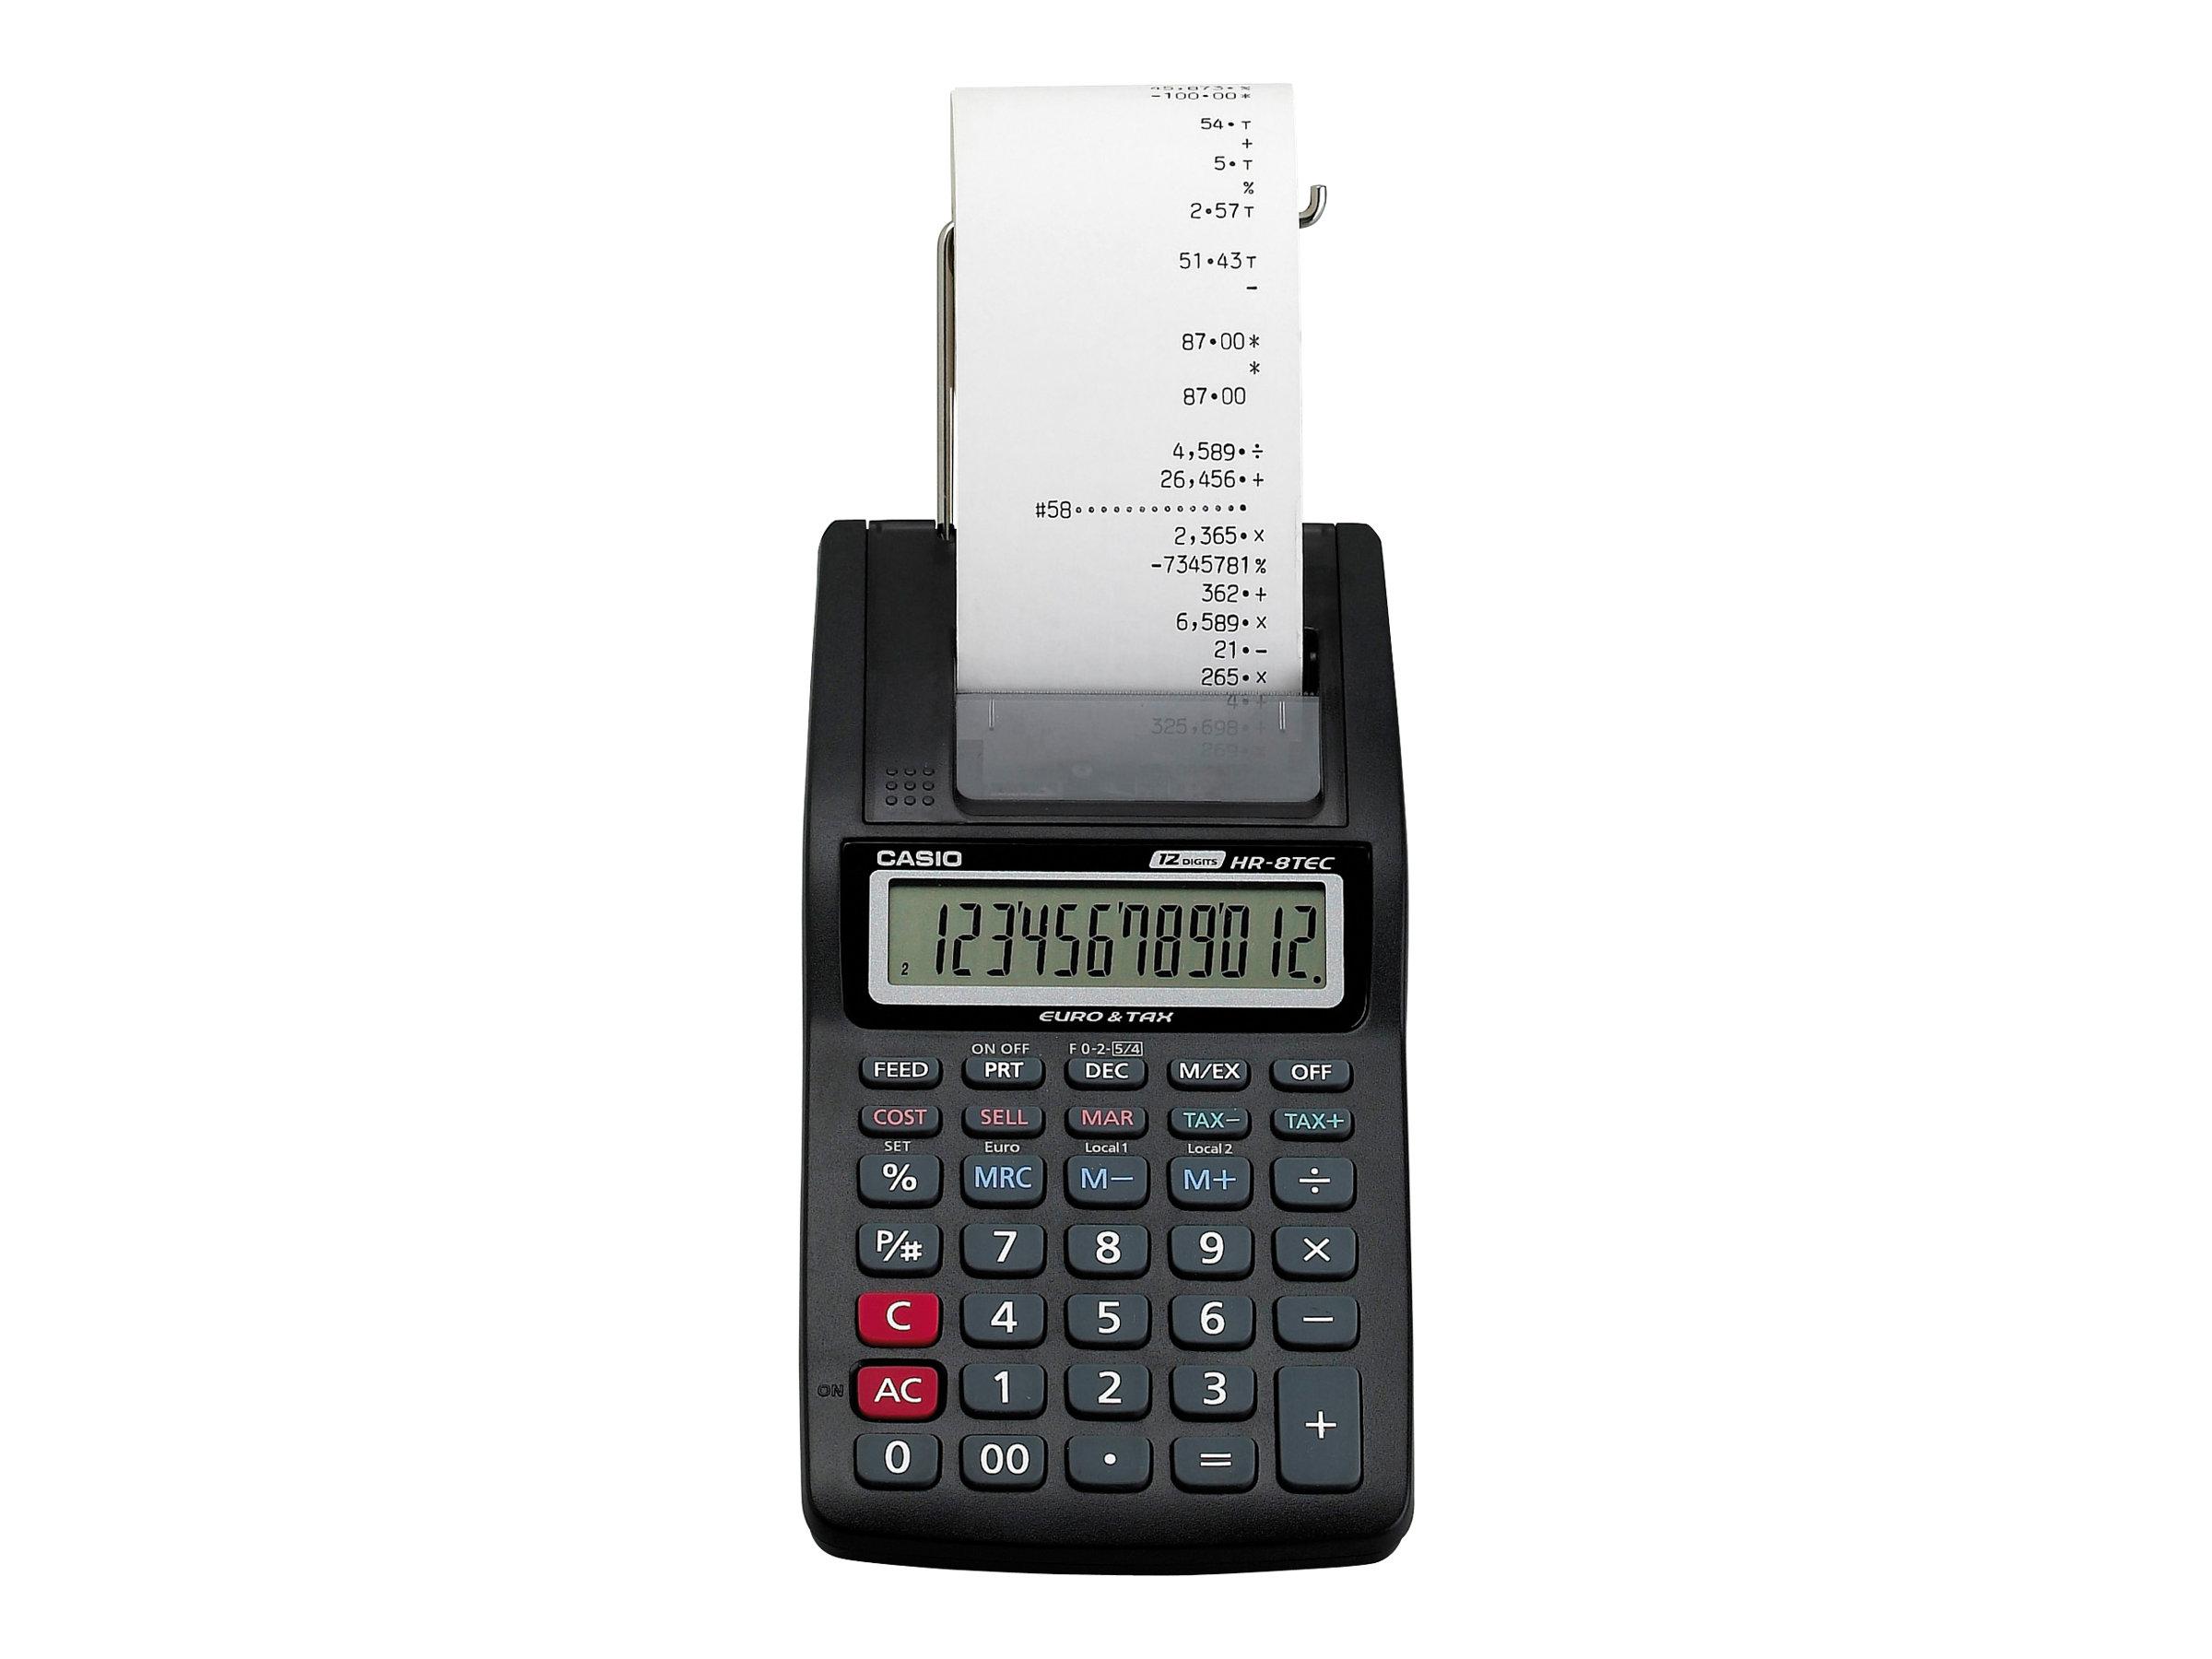 Casio hr 8tec calculatrice avec imprimante for Calculatrice prix